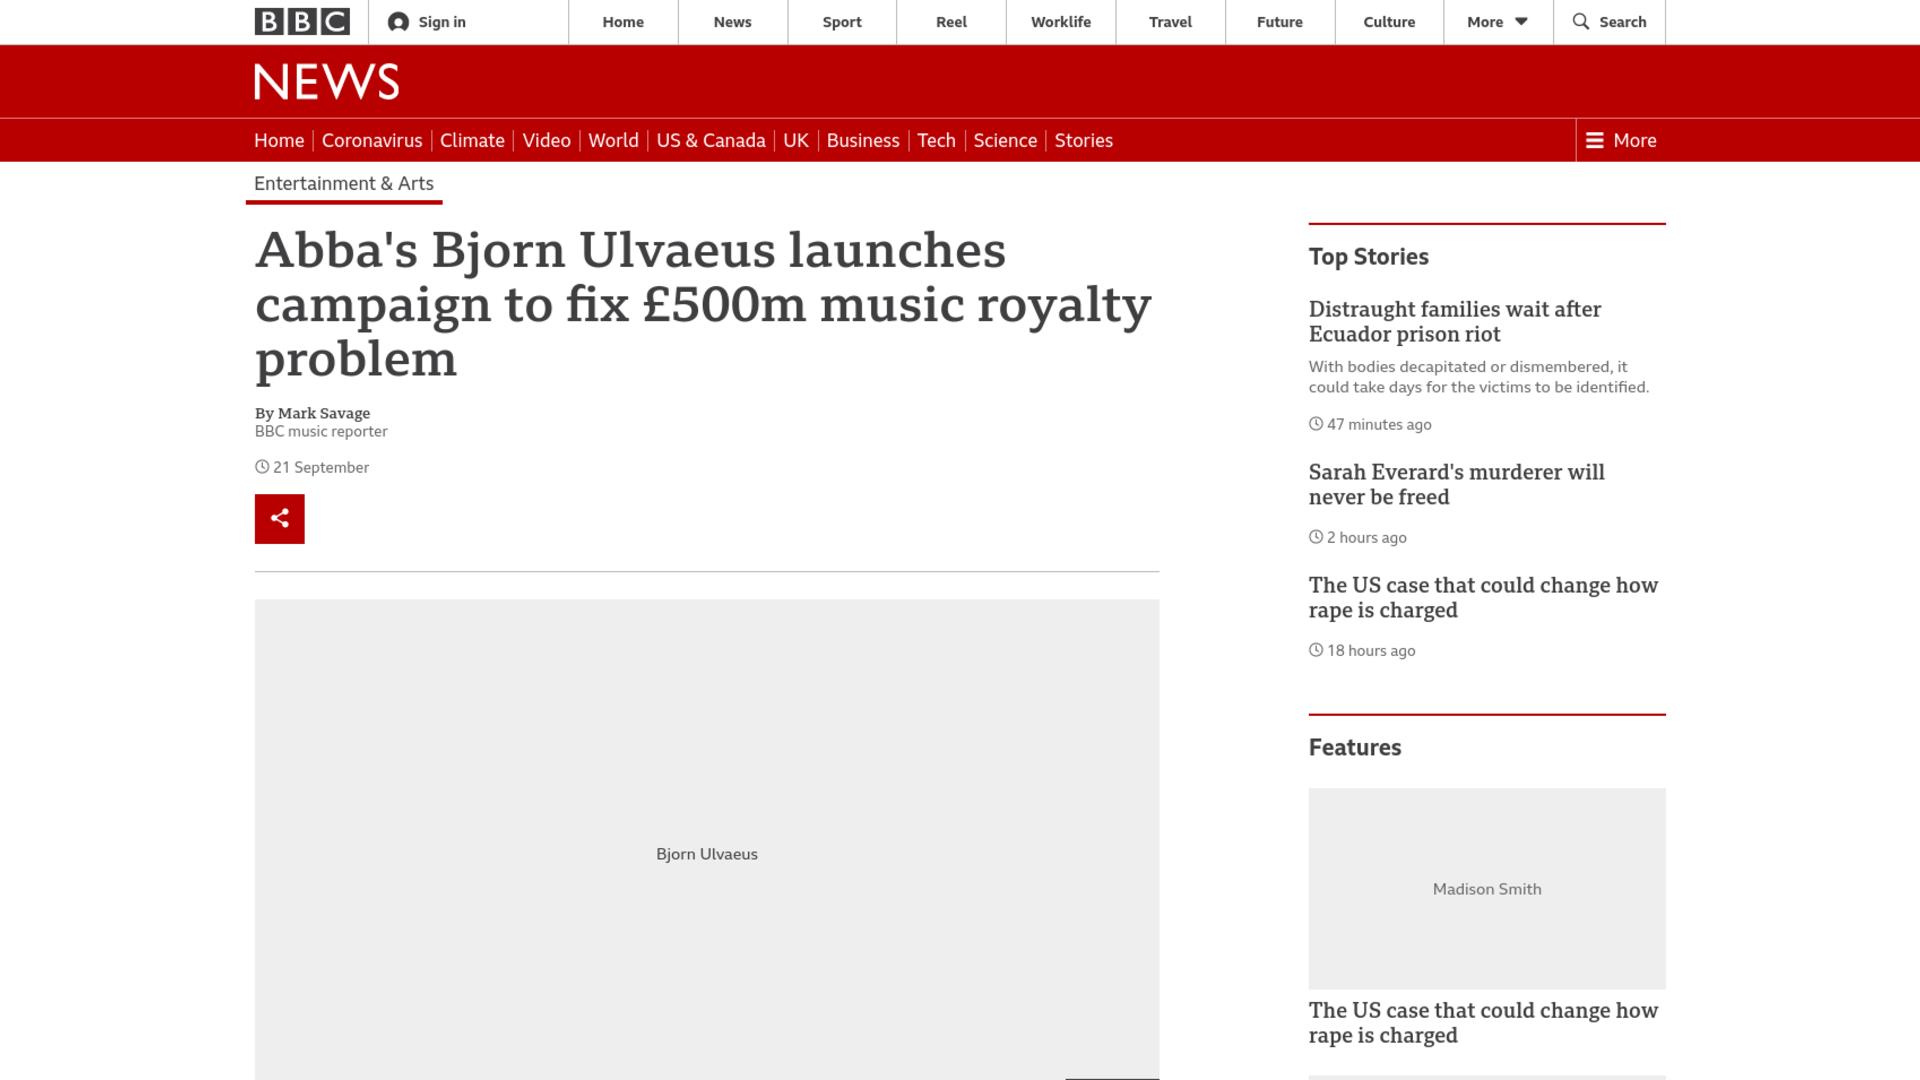 Fairness Rocks News Abba's Bjorn Ulvaeus launches campaign to fix £500m music royalty problem